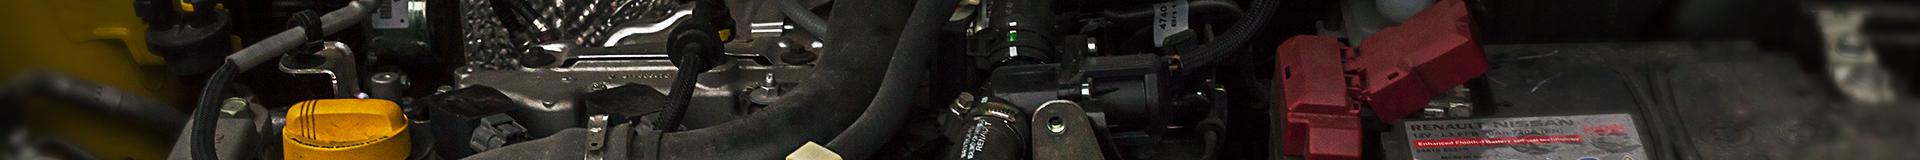 Nissan Juke Engine 115 dig-t